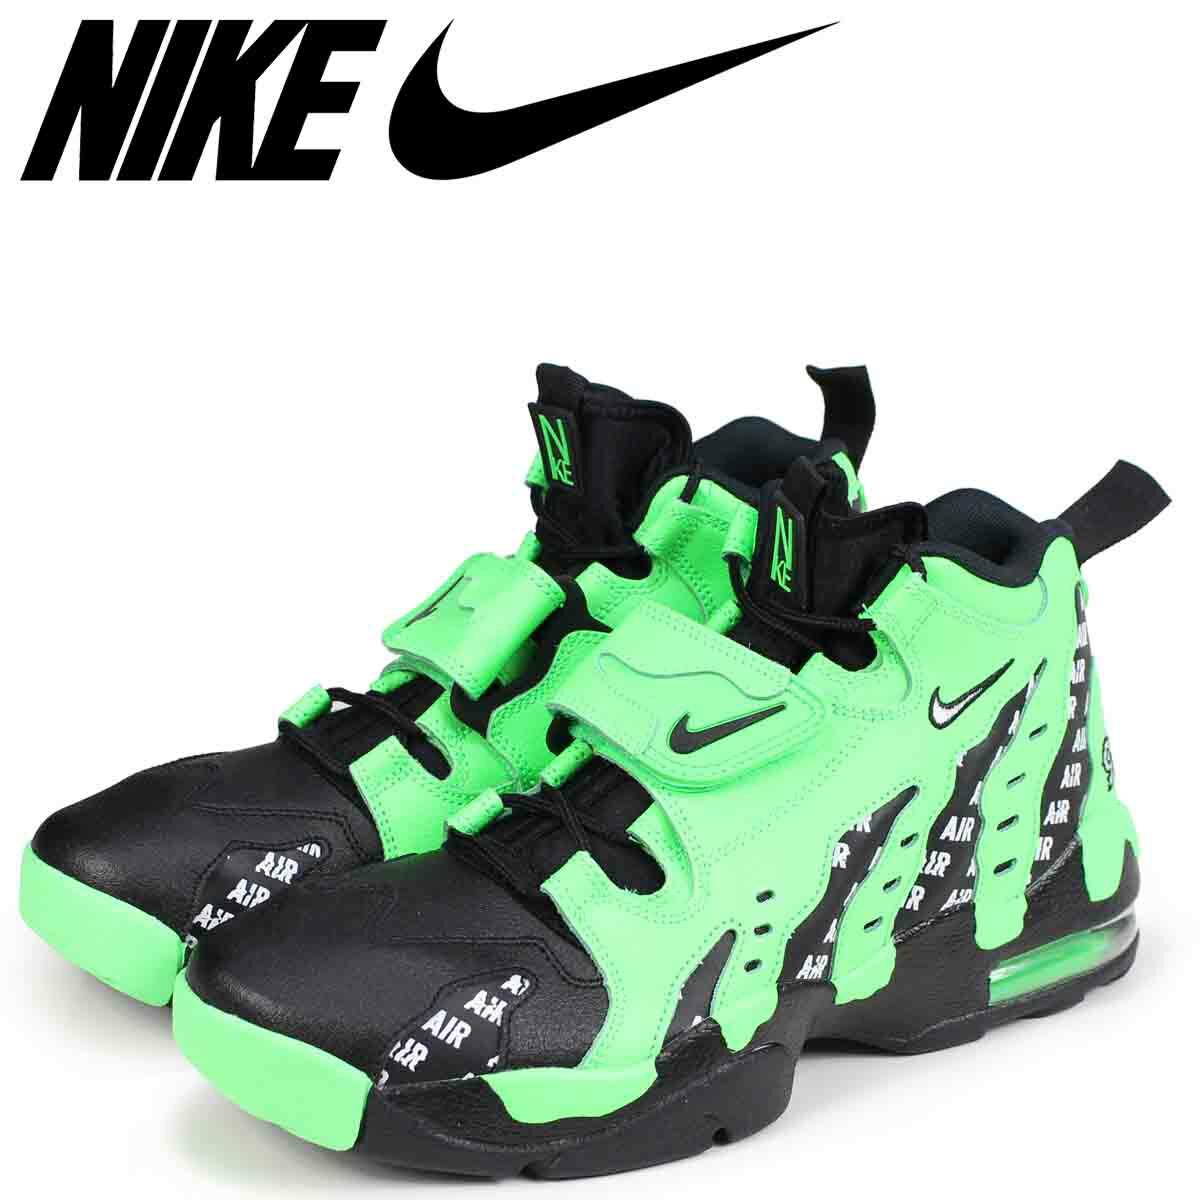 6918be88869 Sugar Online Shop  NIKE Nike air DT max 96 sneakers men AIR DT MAX ...